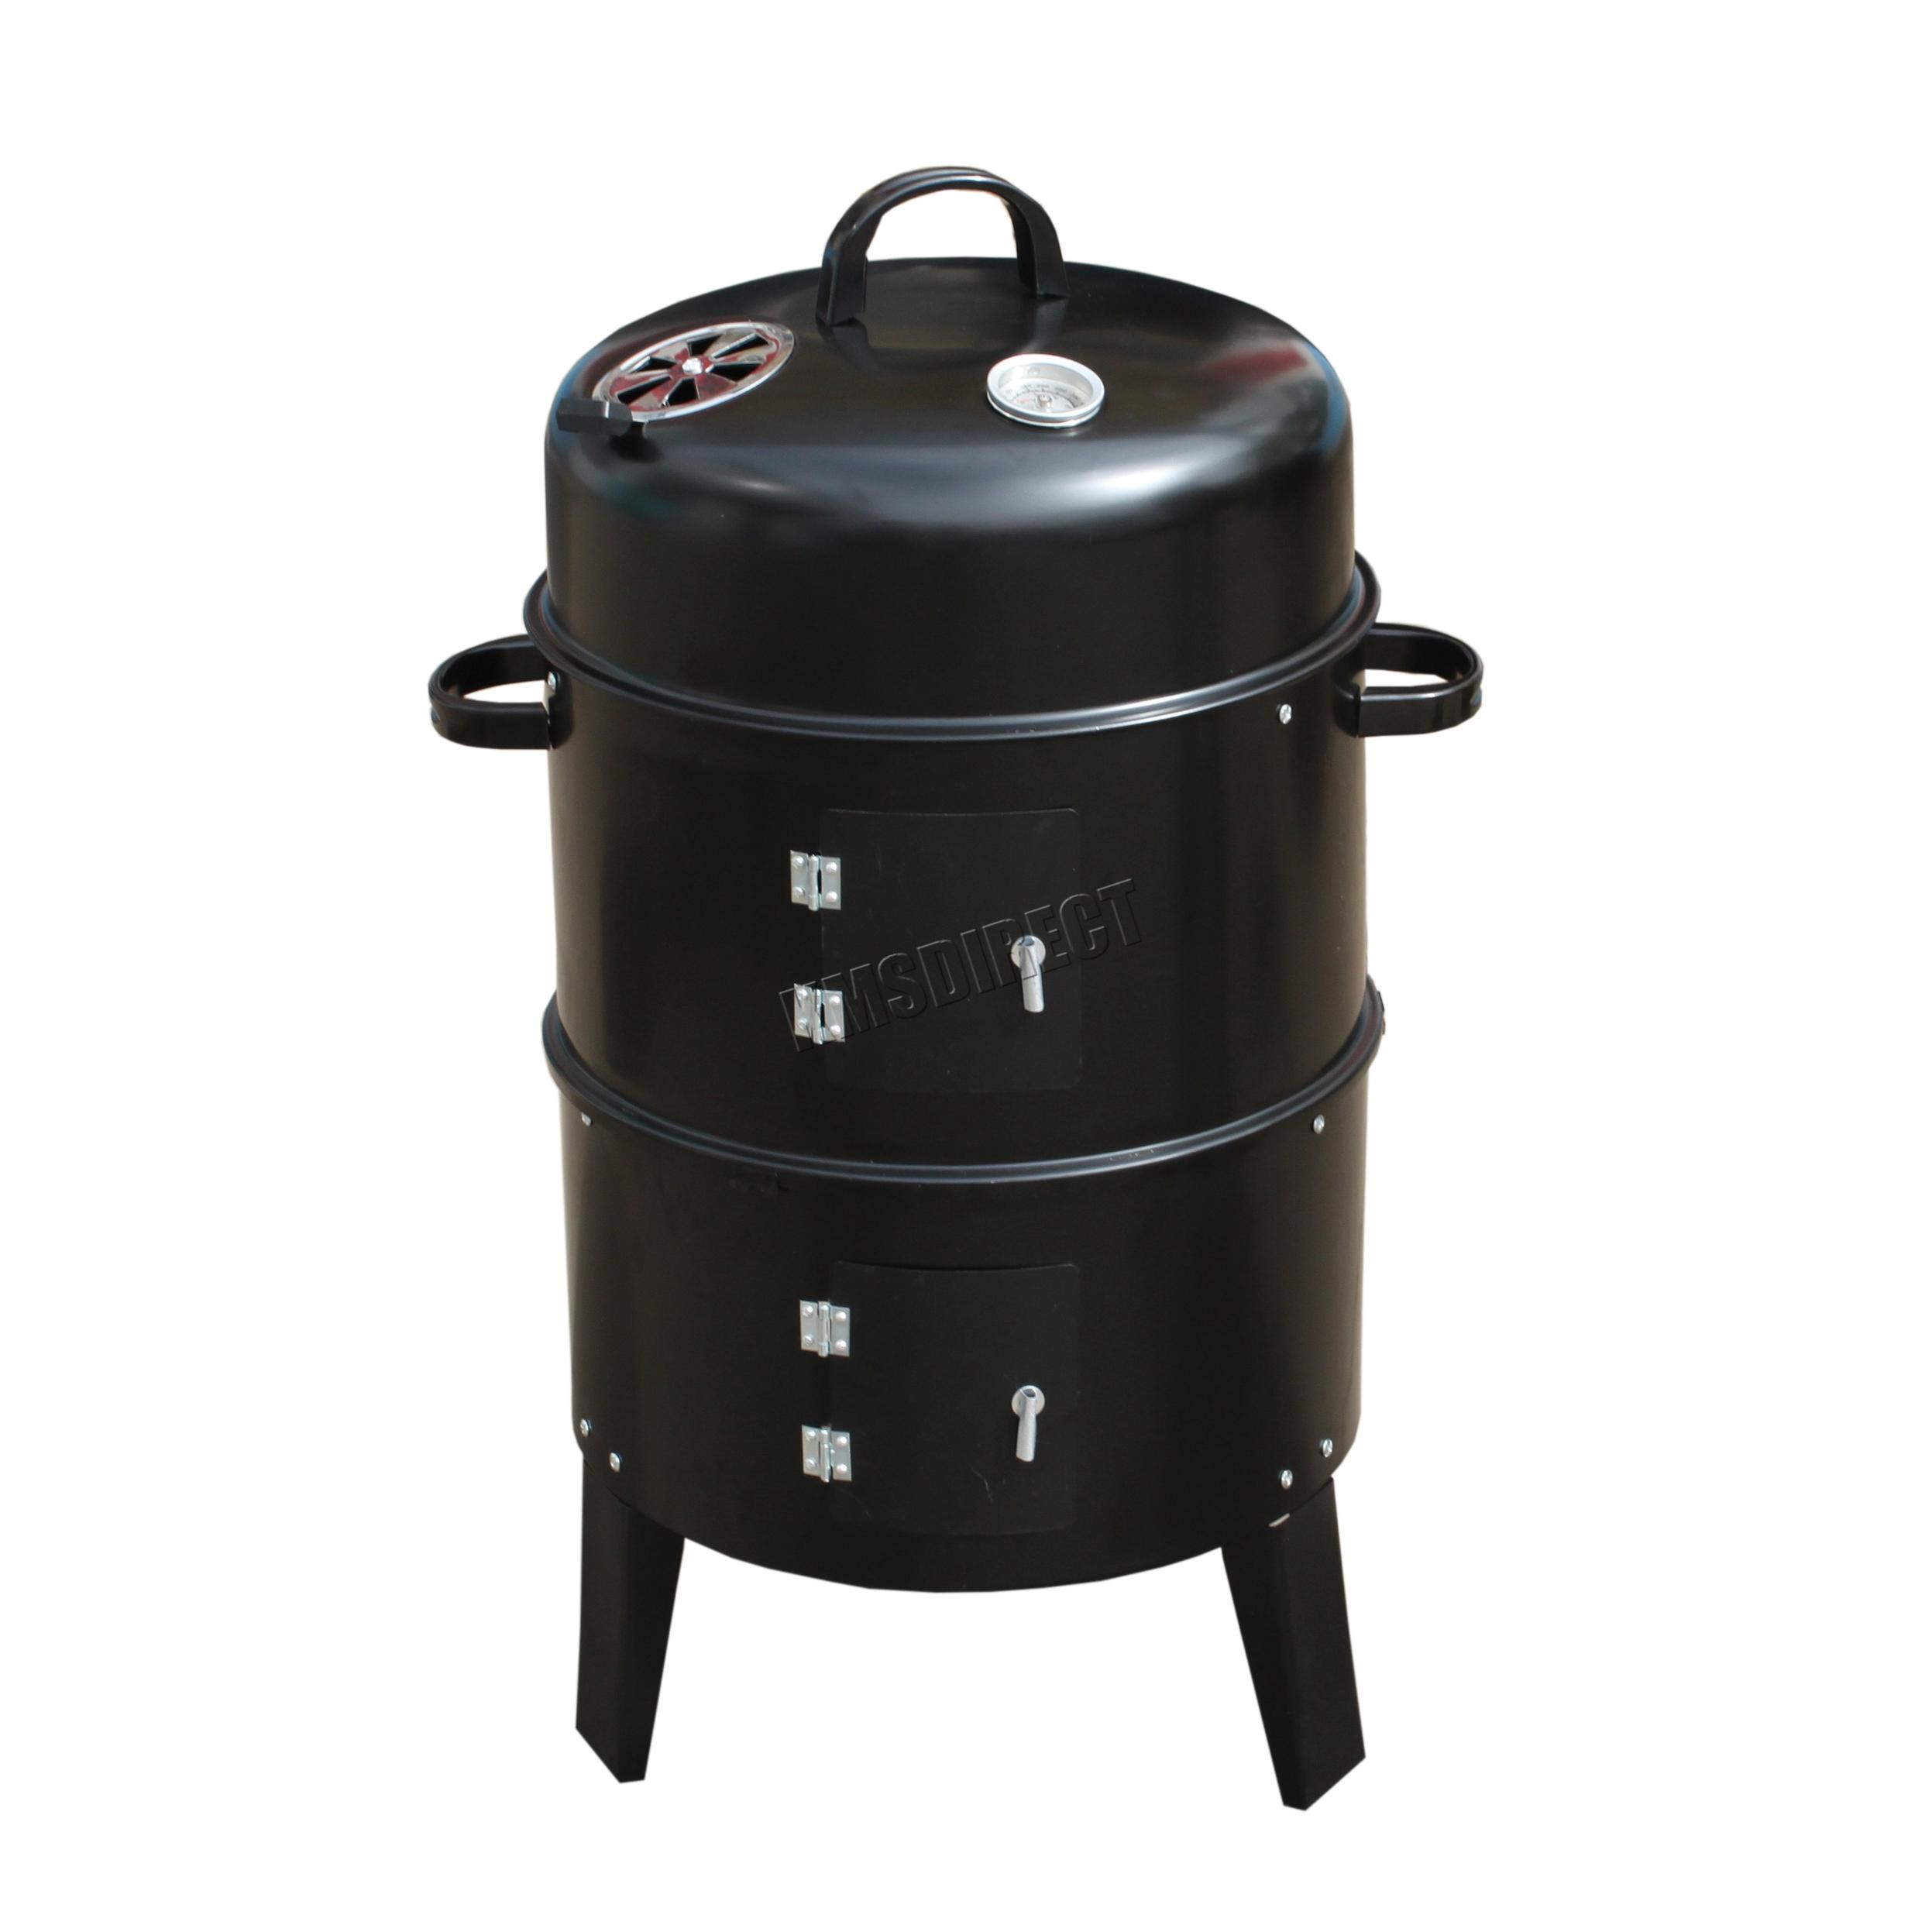 FoxHunter Black BBQ Charcoal Grill Barbecue Smoker Garden ...